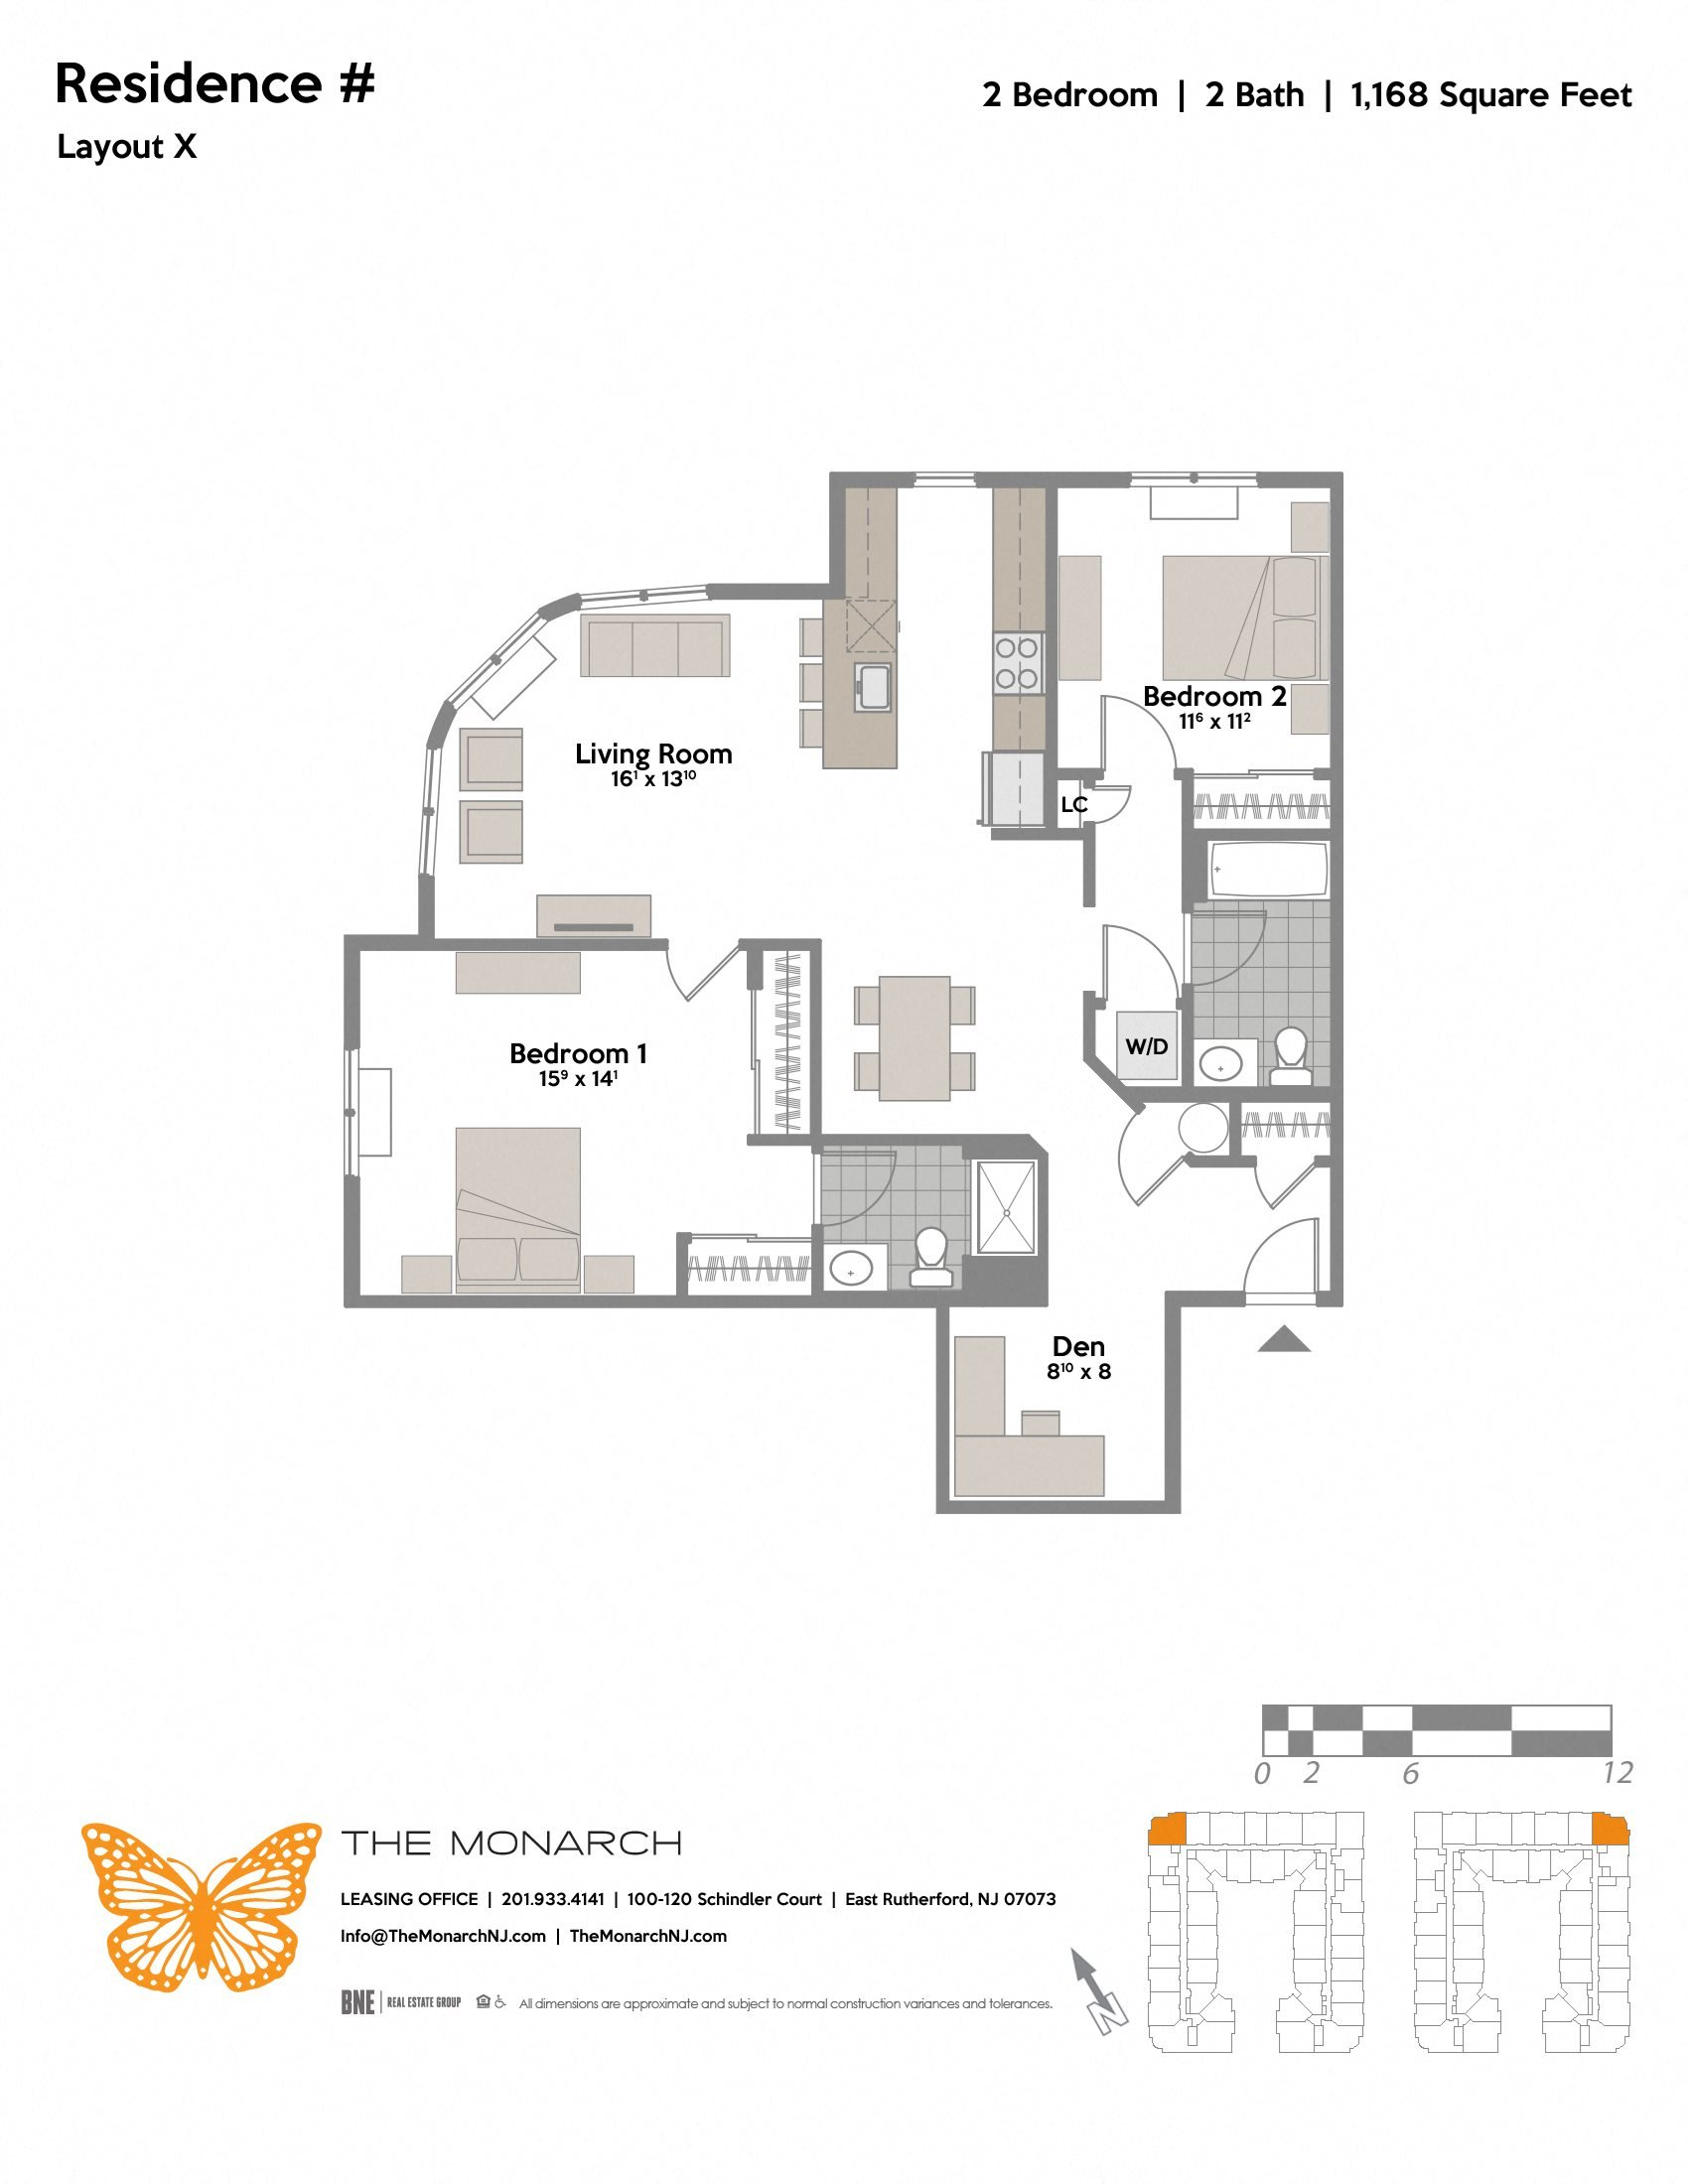 Layout X Floor Plan 7